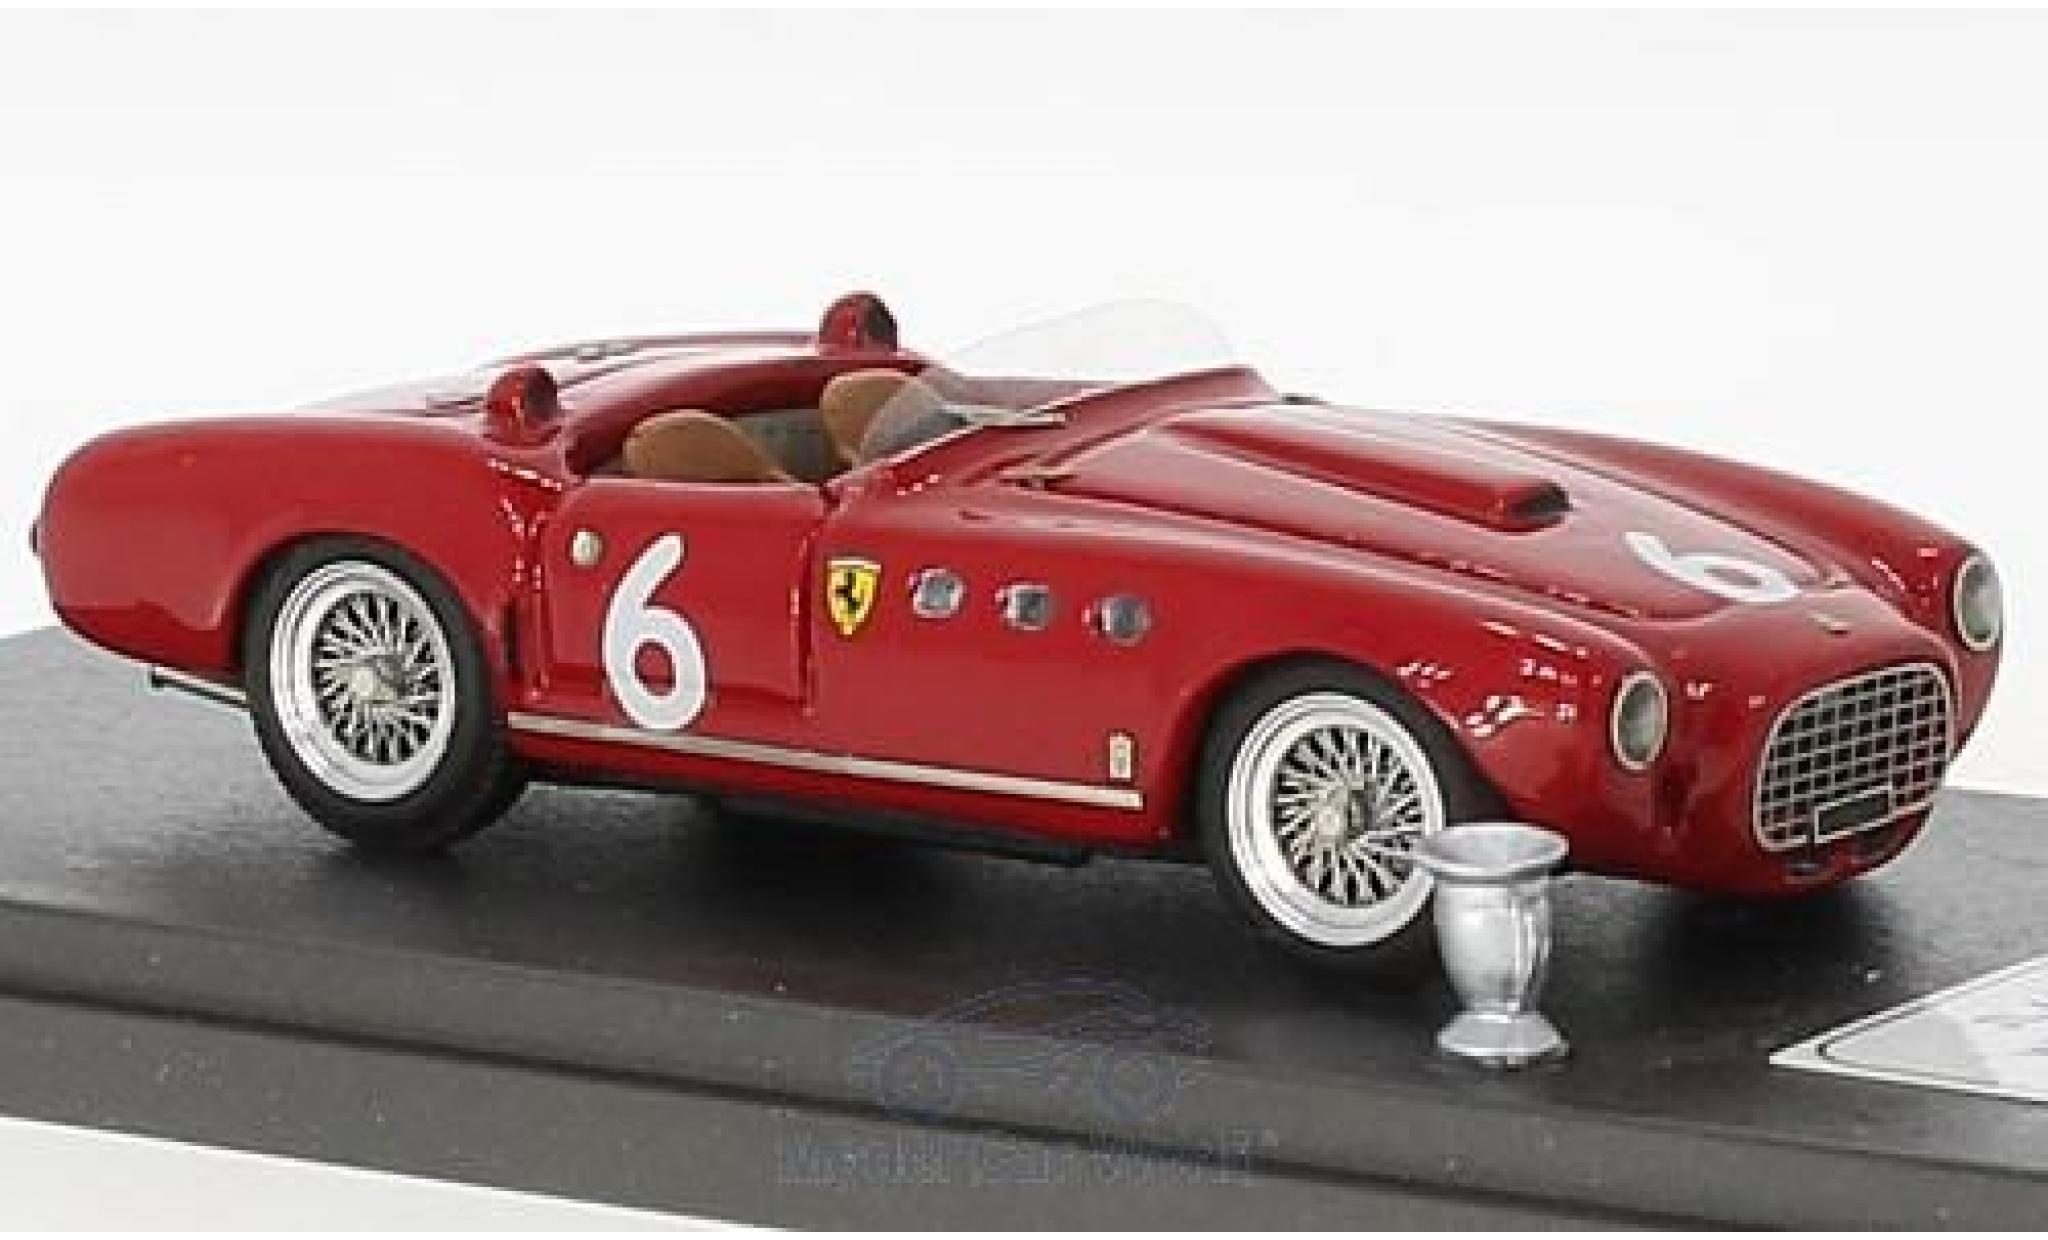 Ferrari 340 1/43 Jolly Model RHD No.6 Stout Field Road Races 1953 J.Kimberly